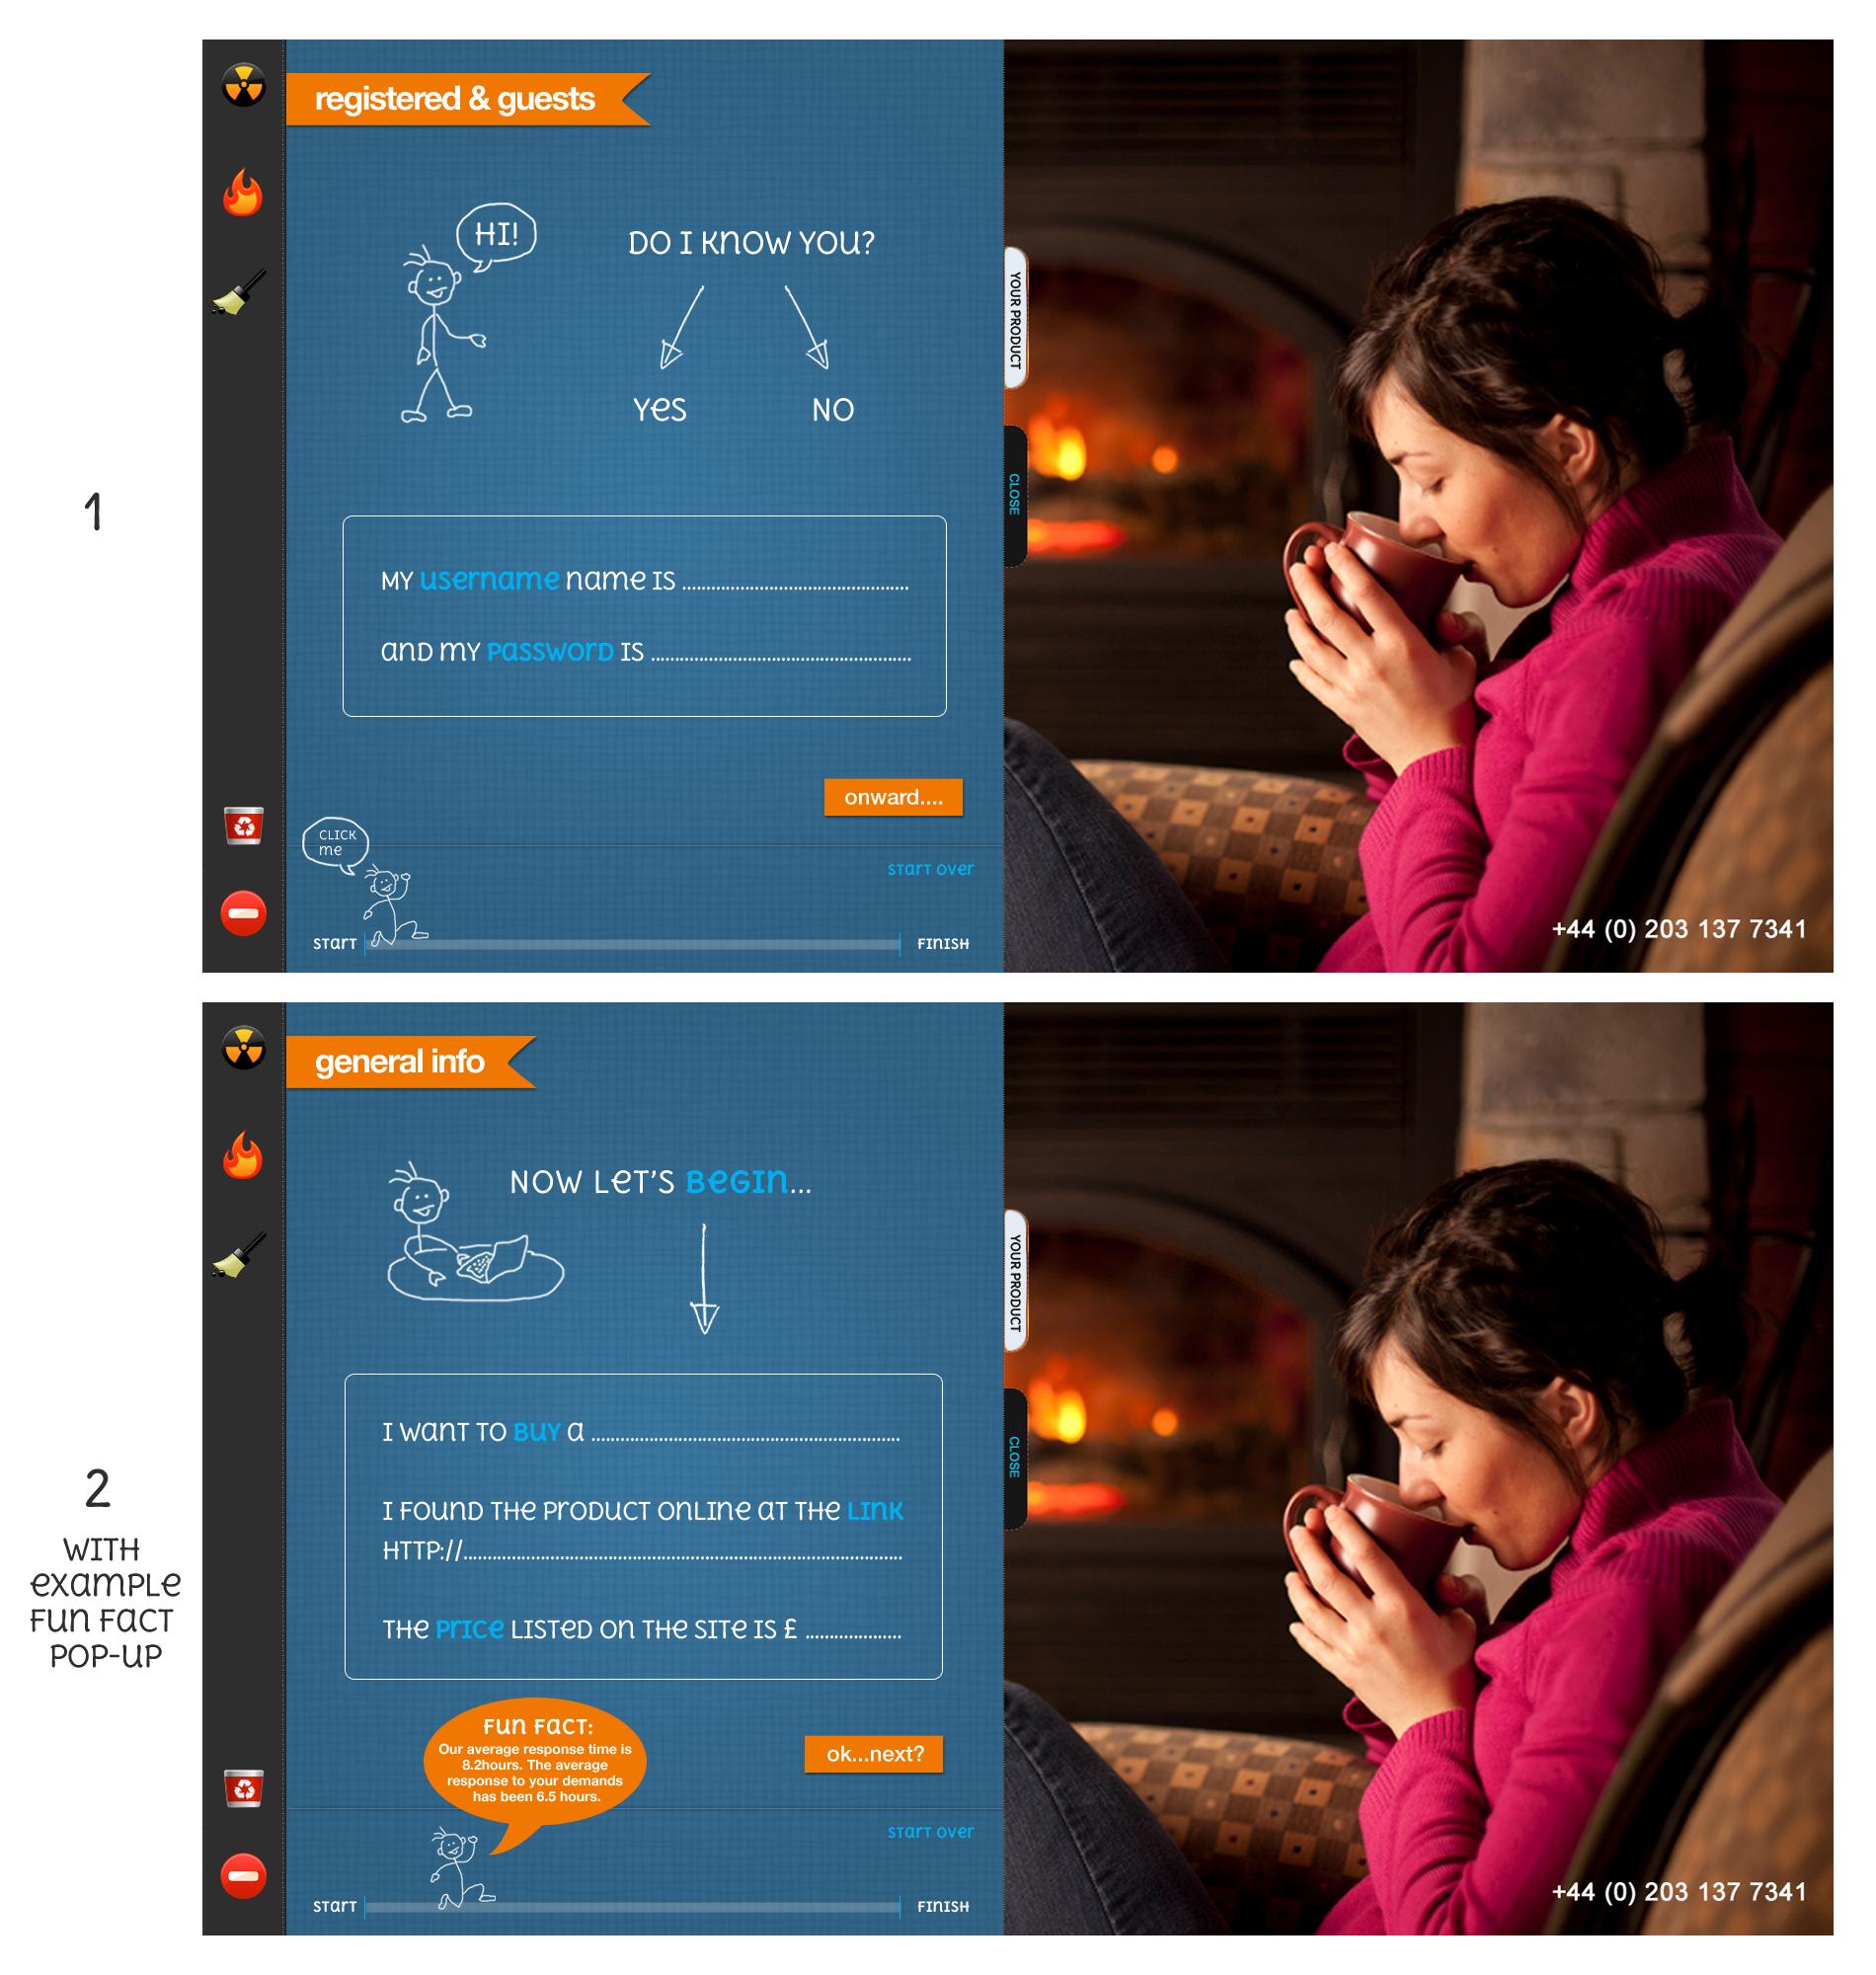 Webform design needed for Amastude